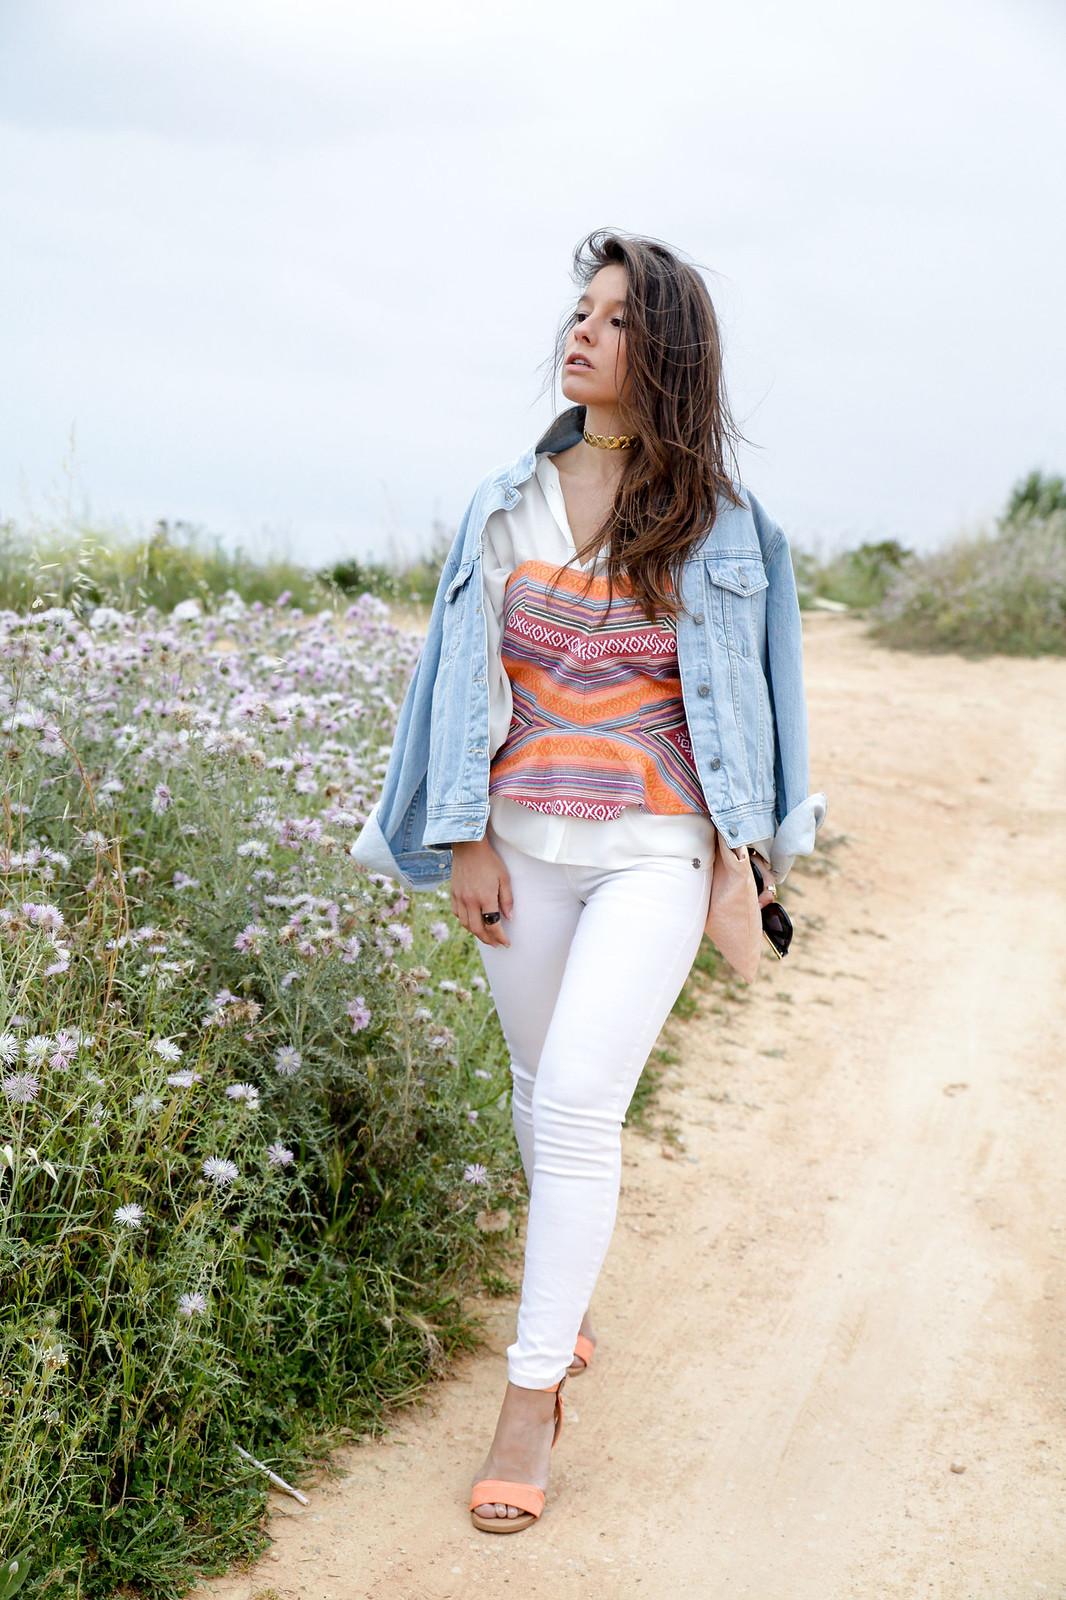 012_corset_etnico_danity_paris_theguestgirl_influencer_barcelona_laura_santolaria